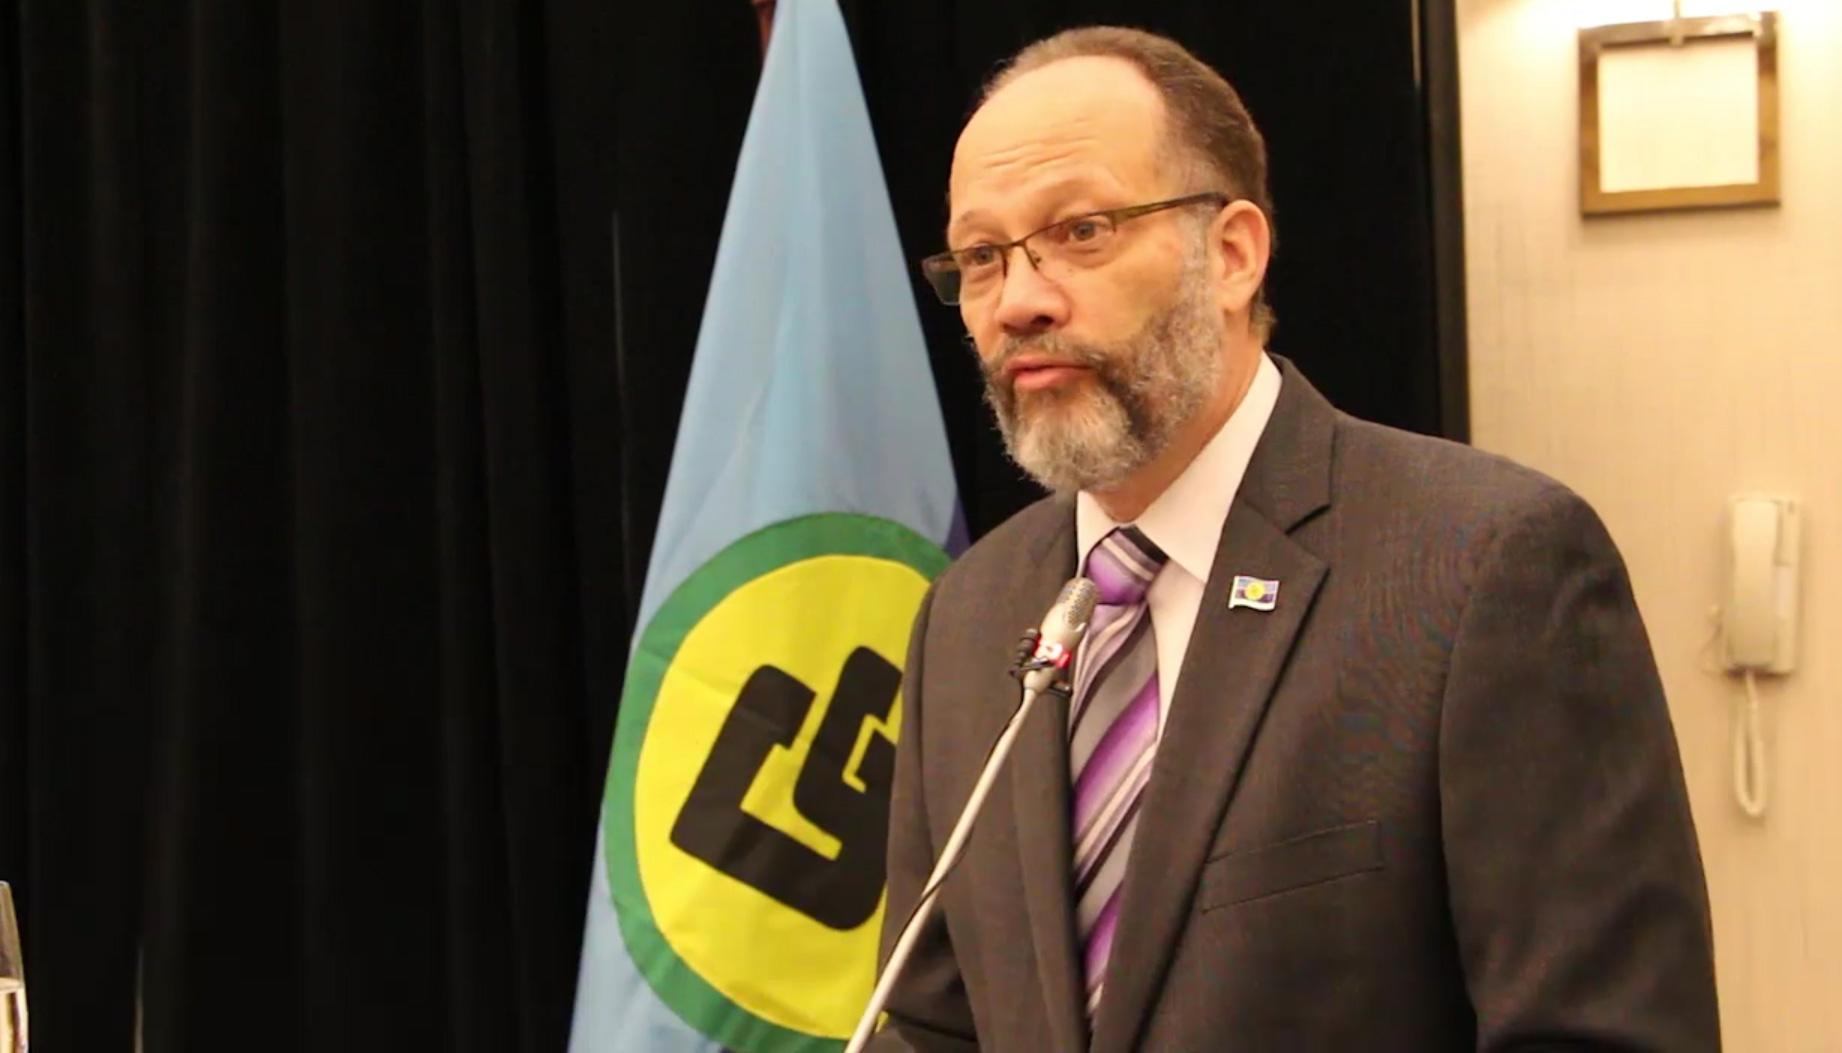 CARICOM Sec Gen: Urgent funding needed in wake of catastrophic hurricanes